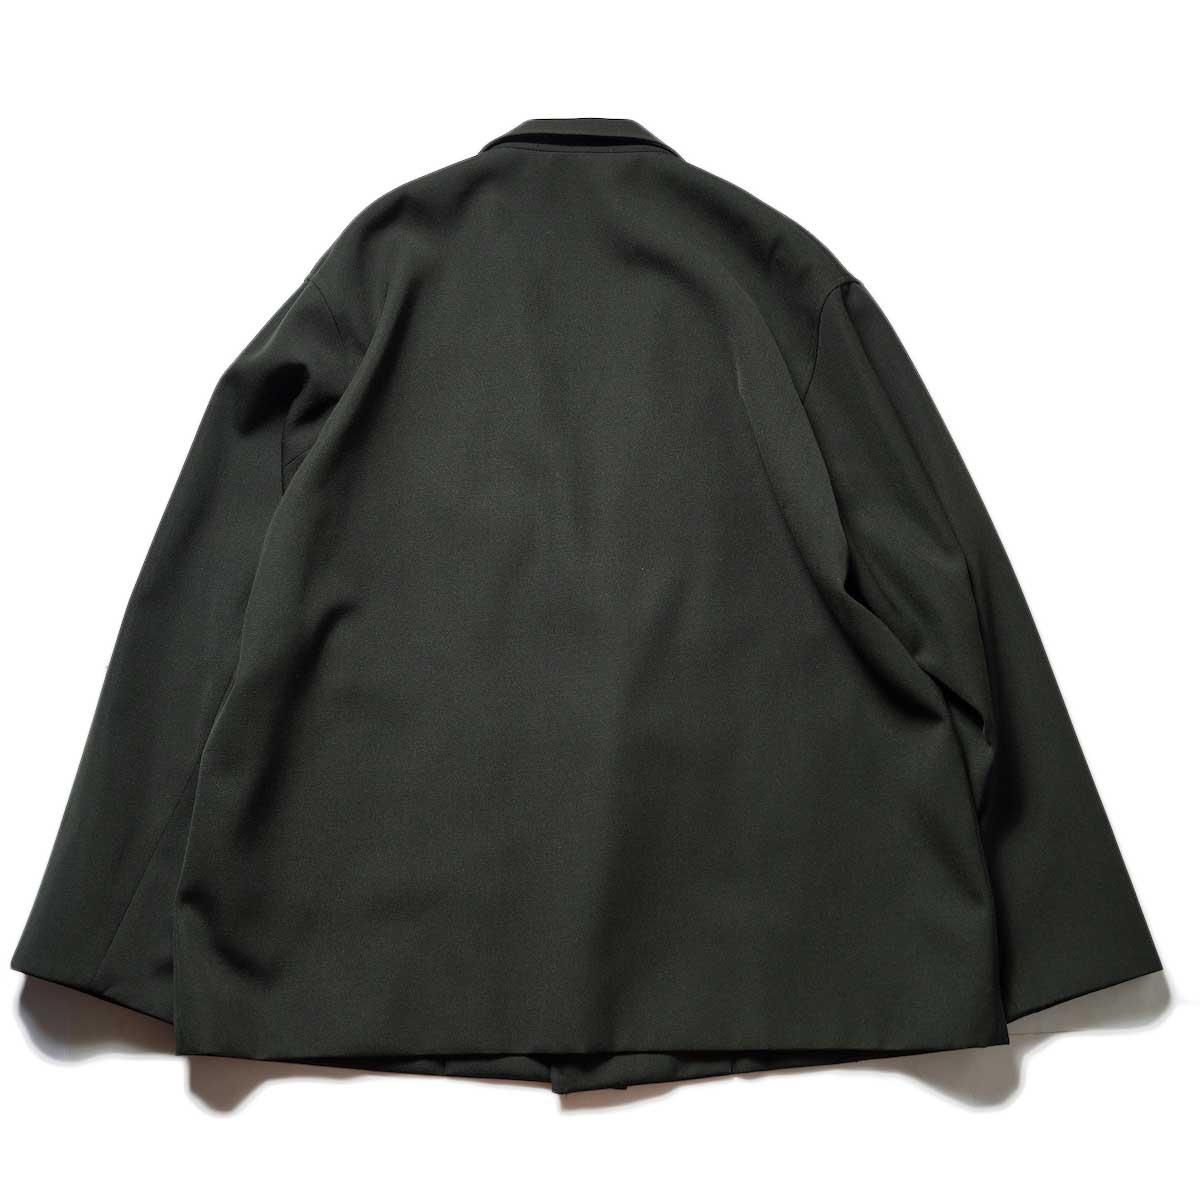 blurhms / Wool Surge Cardigan Jacket (Khaki Grey)背面